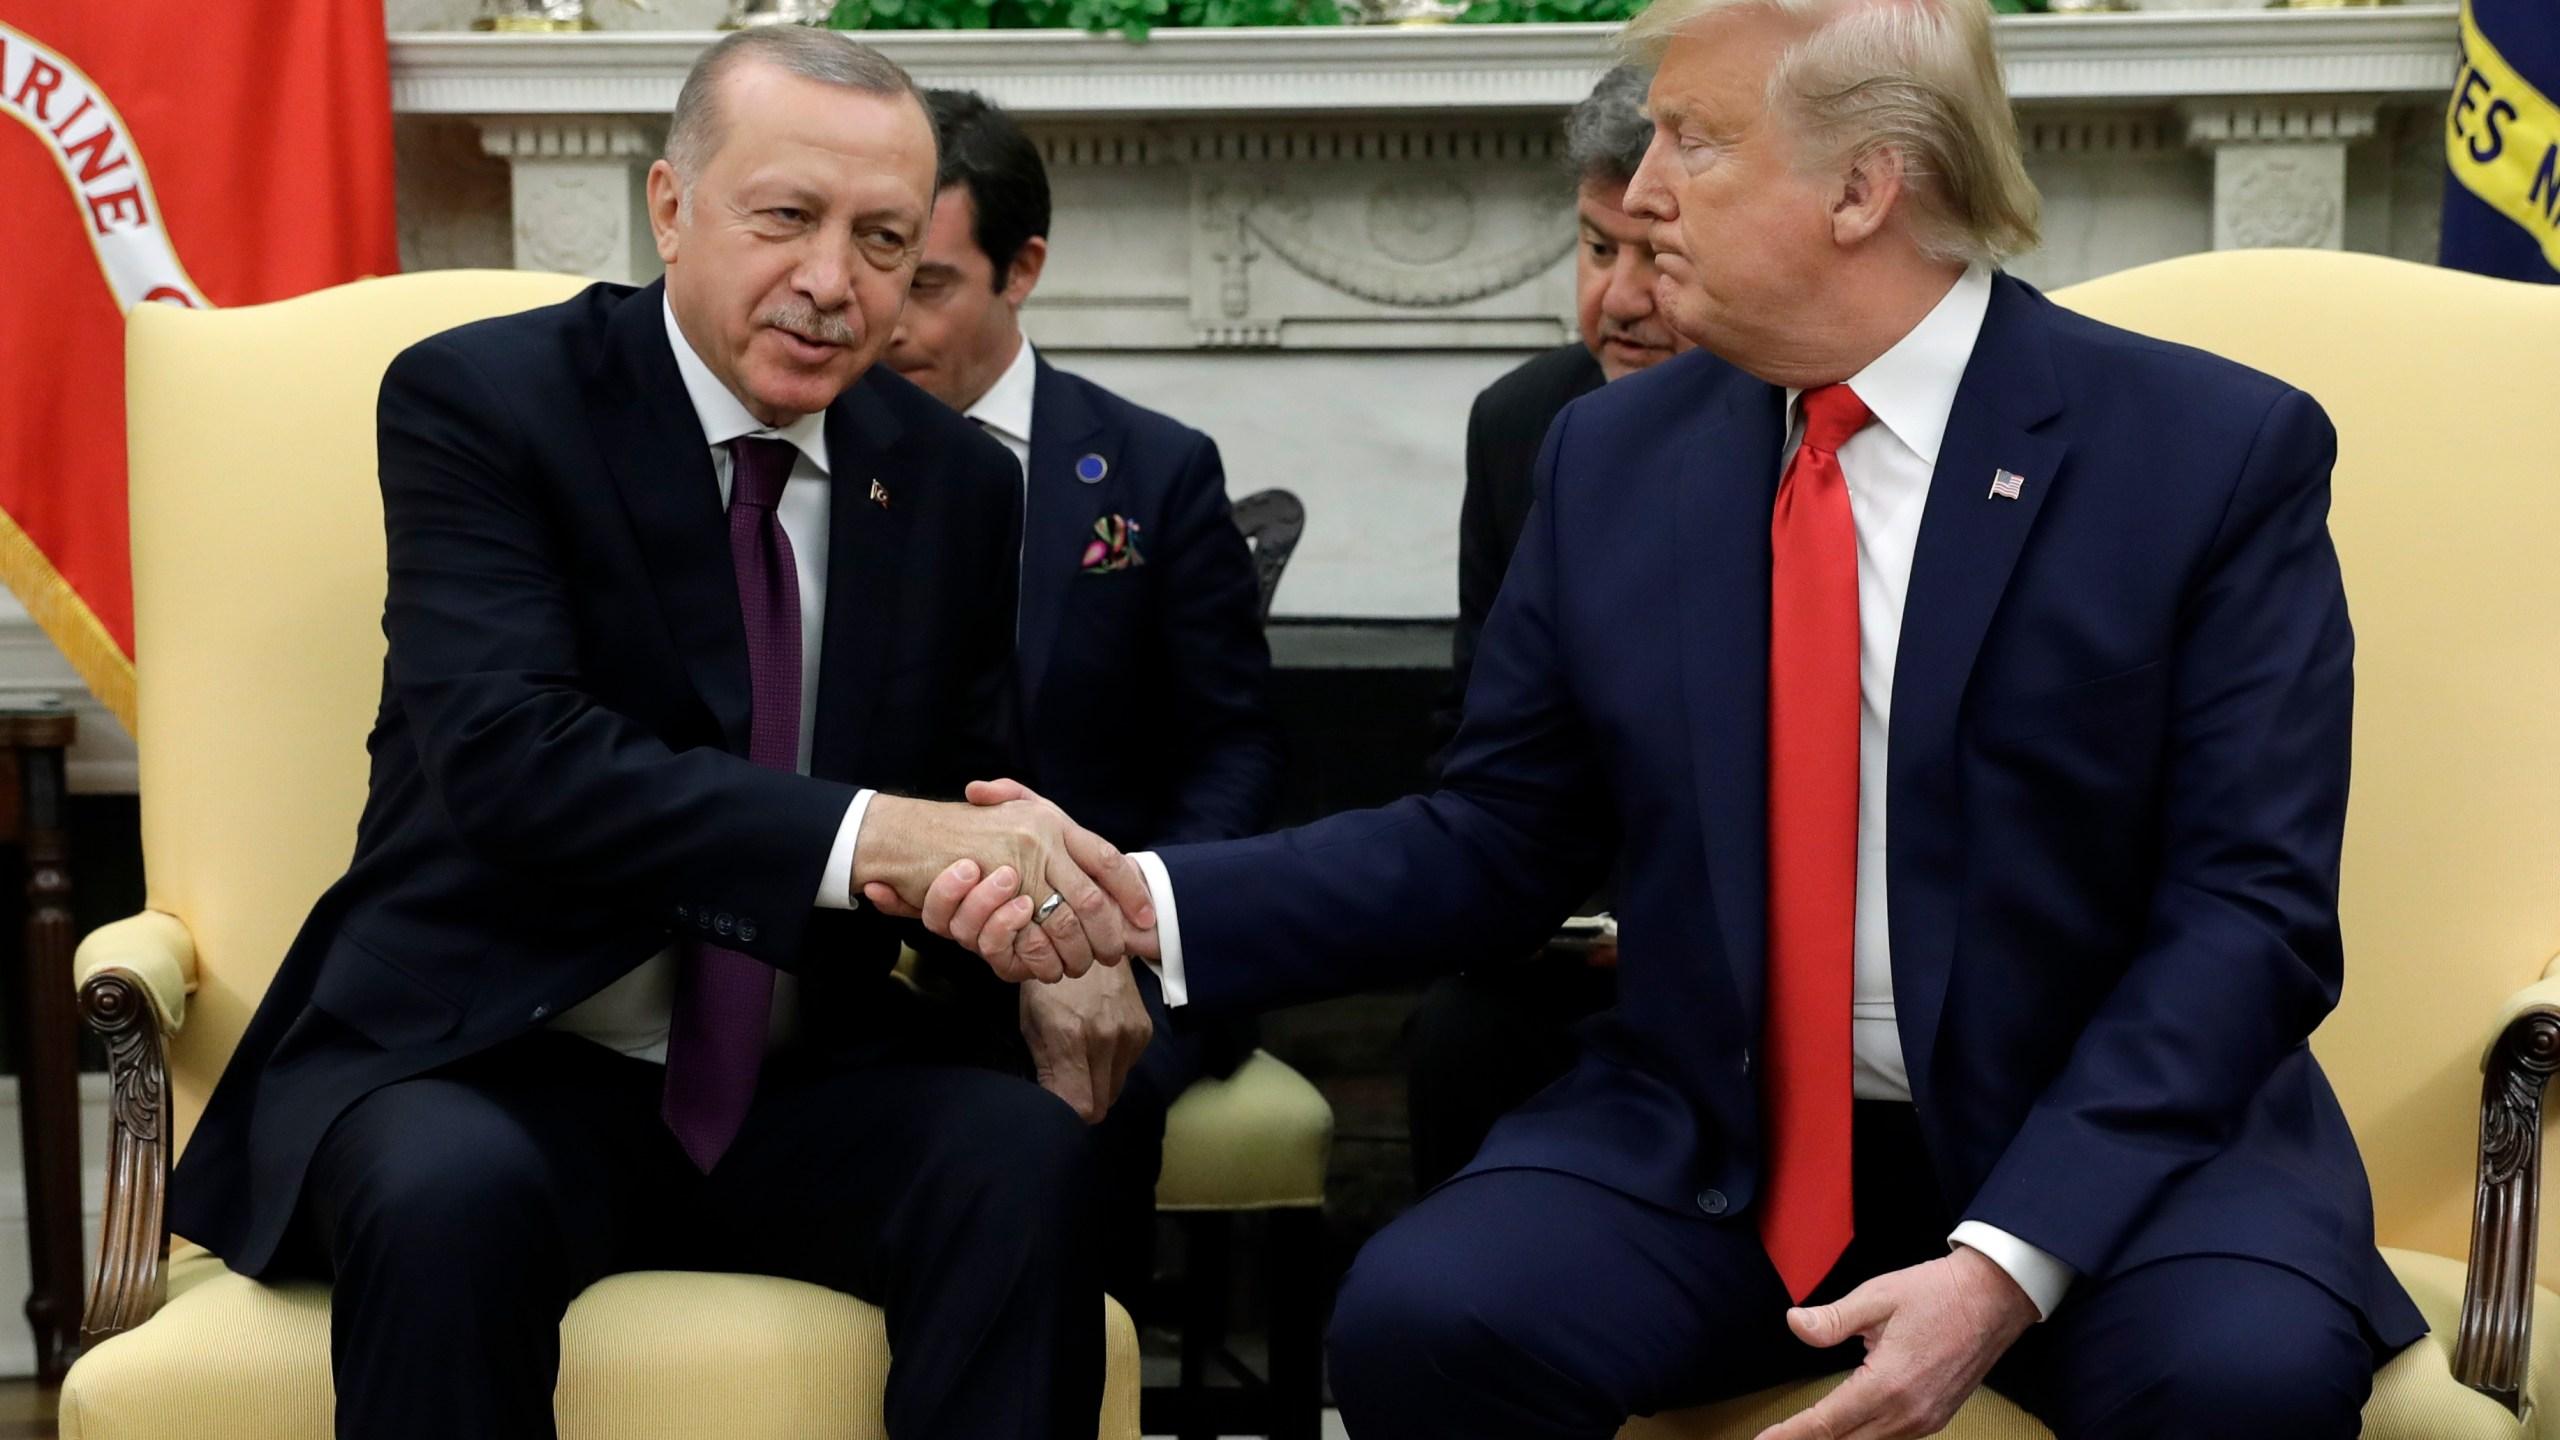 Donald Trump, Recep Tayyip Erdogan, Melania Trump, Emine Erdogan